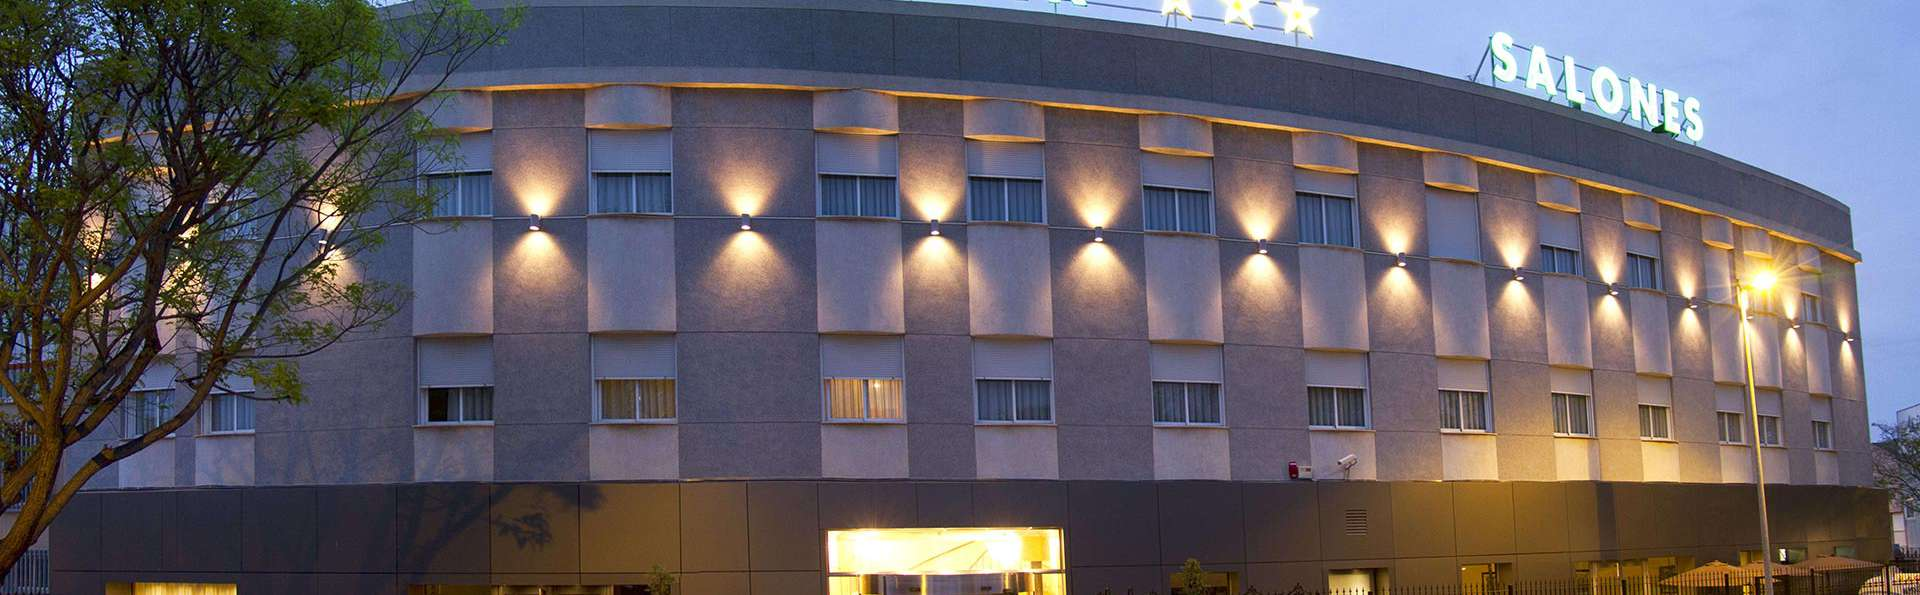 Sercotel Hotel Ciscar - edit_facade1.jpg